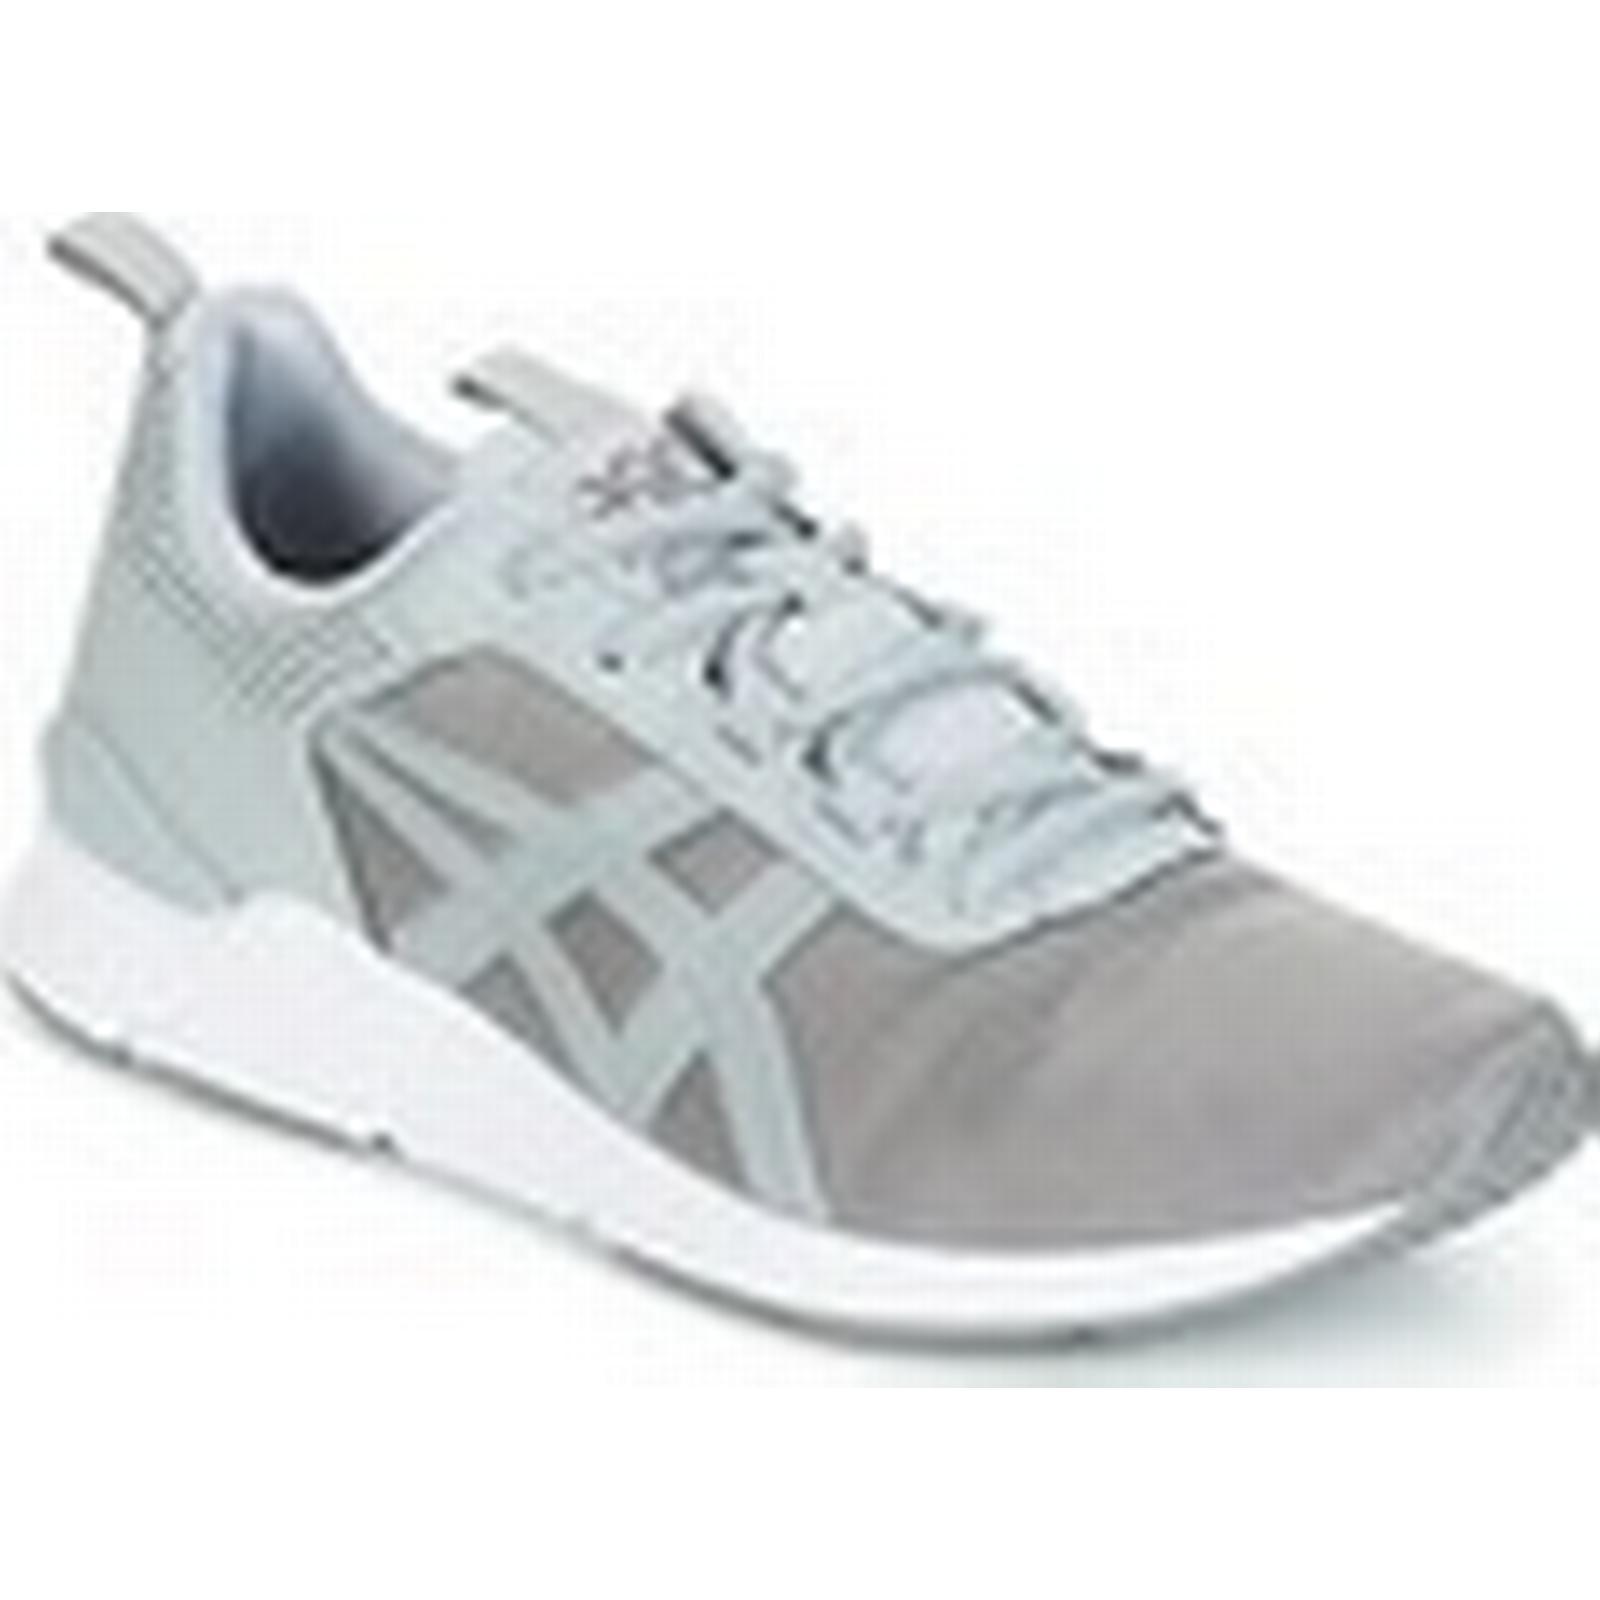 Asics  GEL-LYTE RUNNER   RUNNER women's Shoes (Trainers) in Grey d4fa07